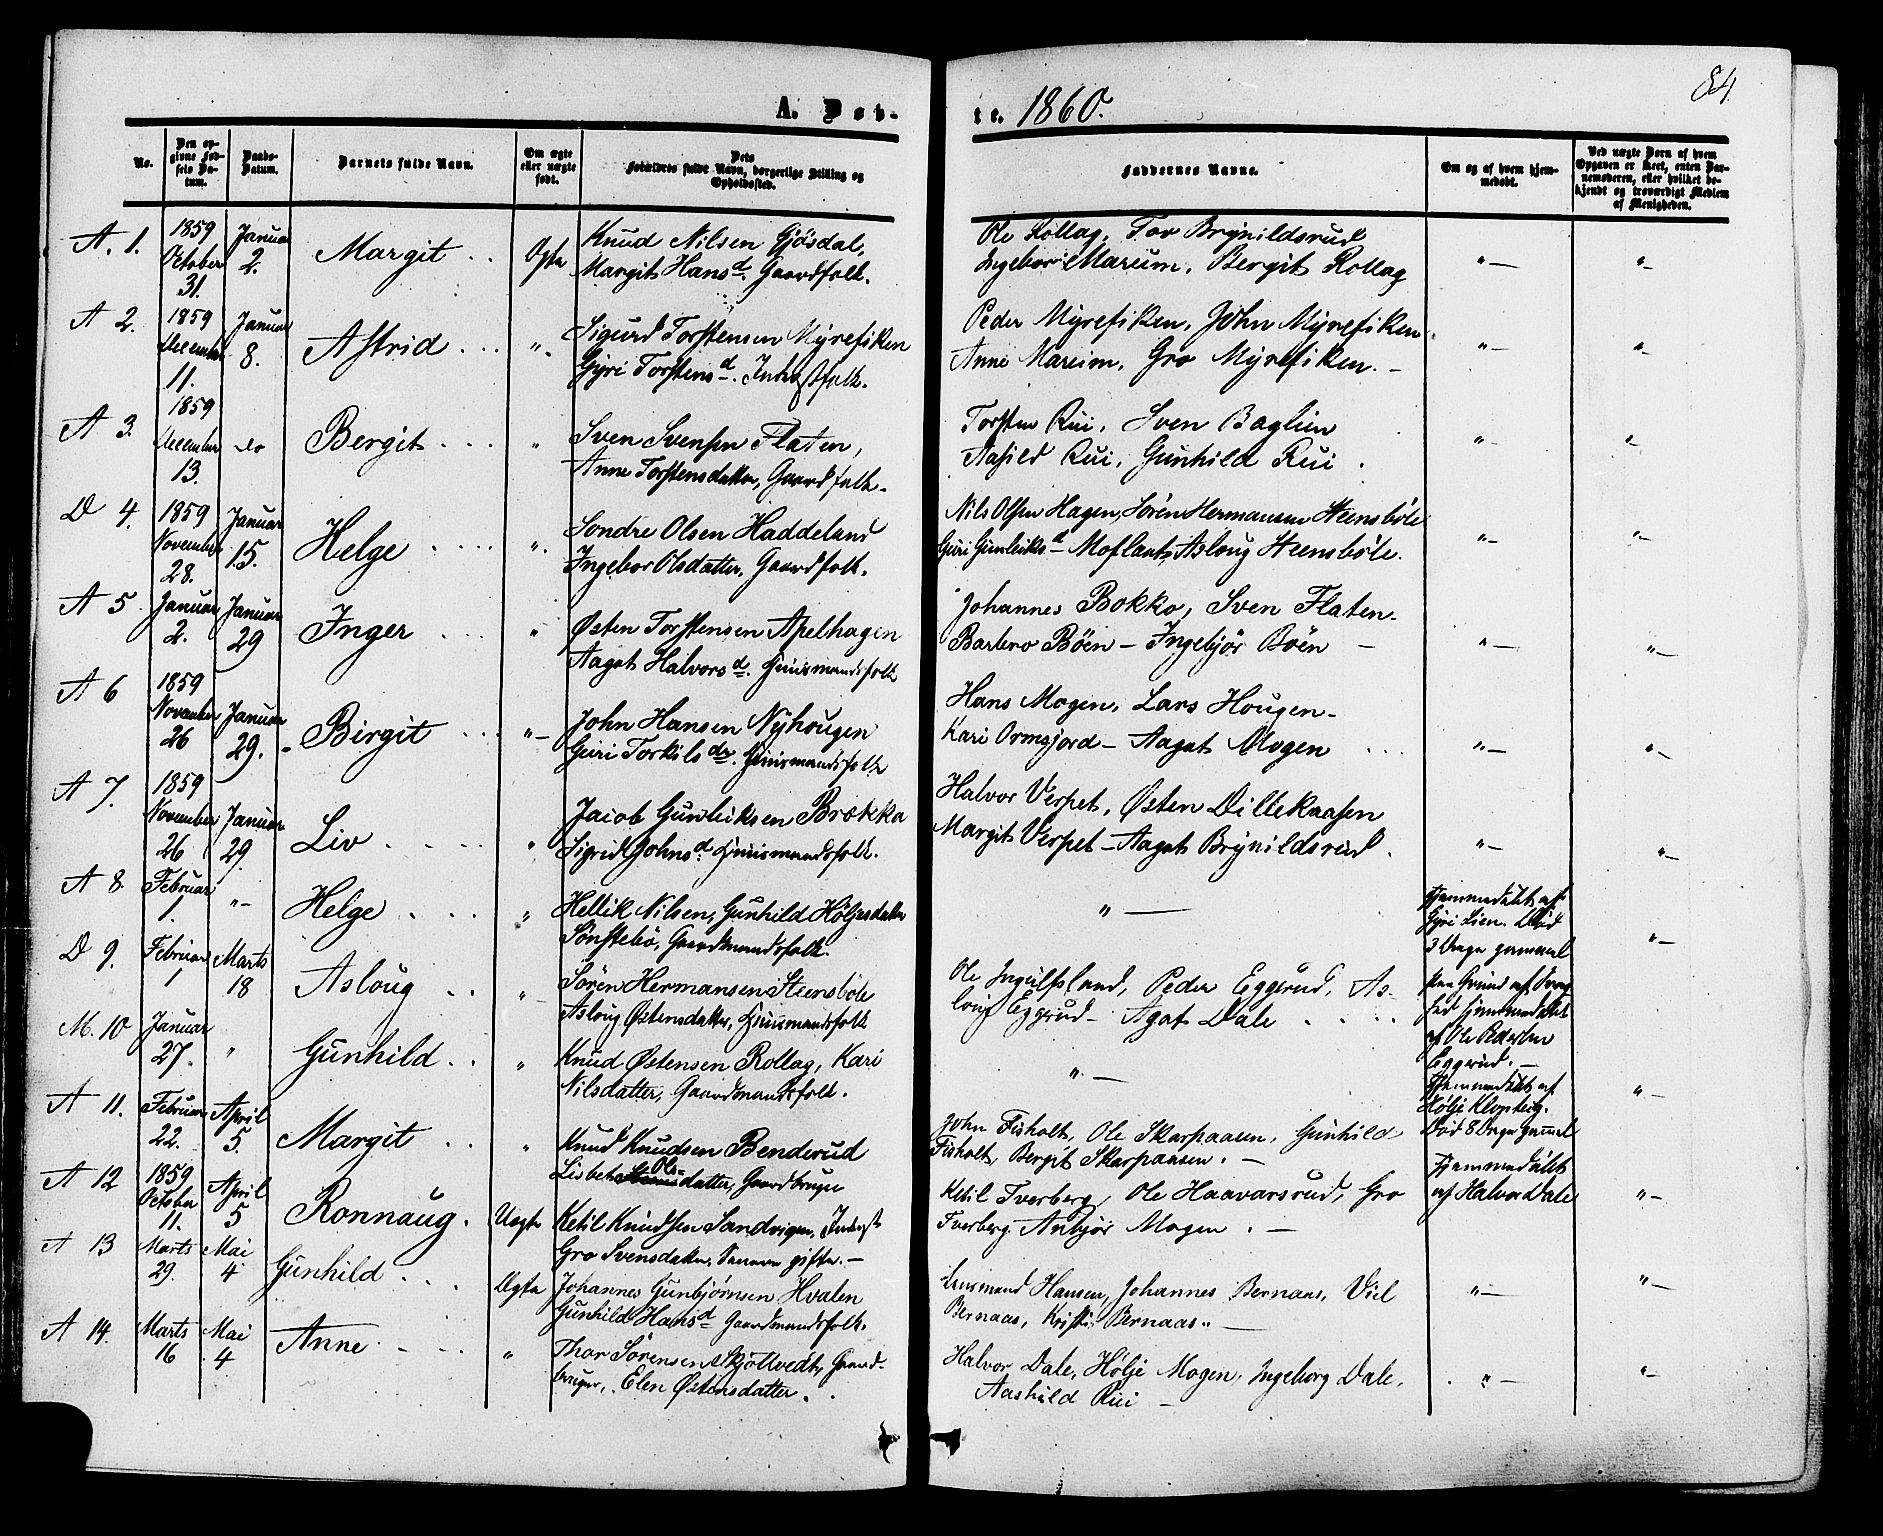 SAKO, Tinn kirkebøker, F/Fa/L0006: Ministerialbok nr. I 6, 1857-1878, s. 84